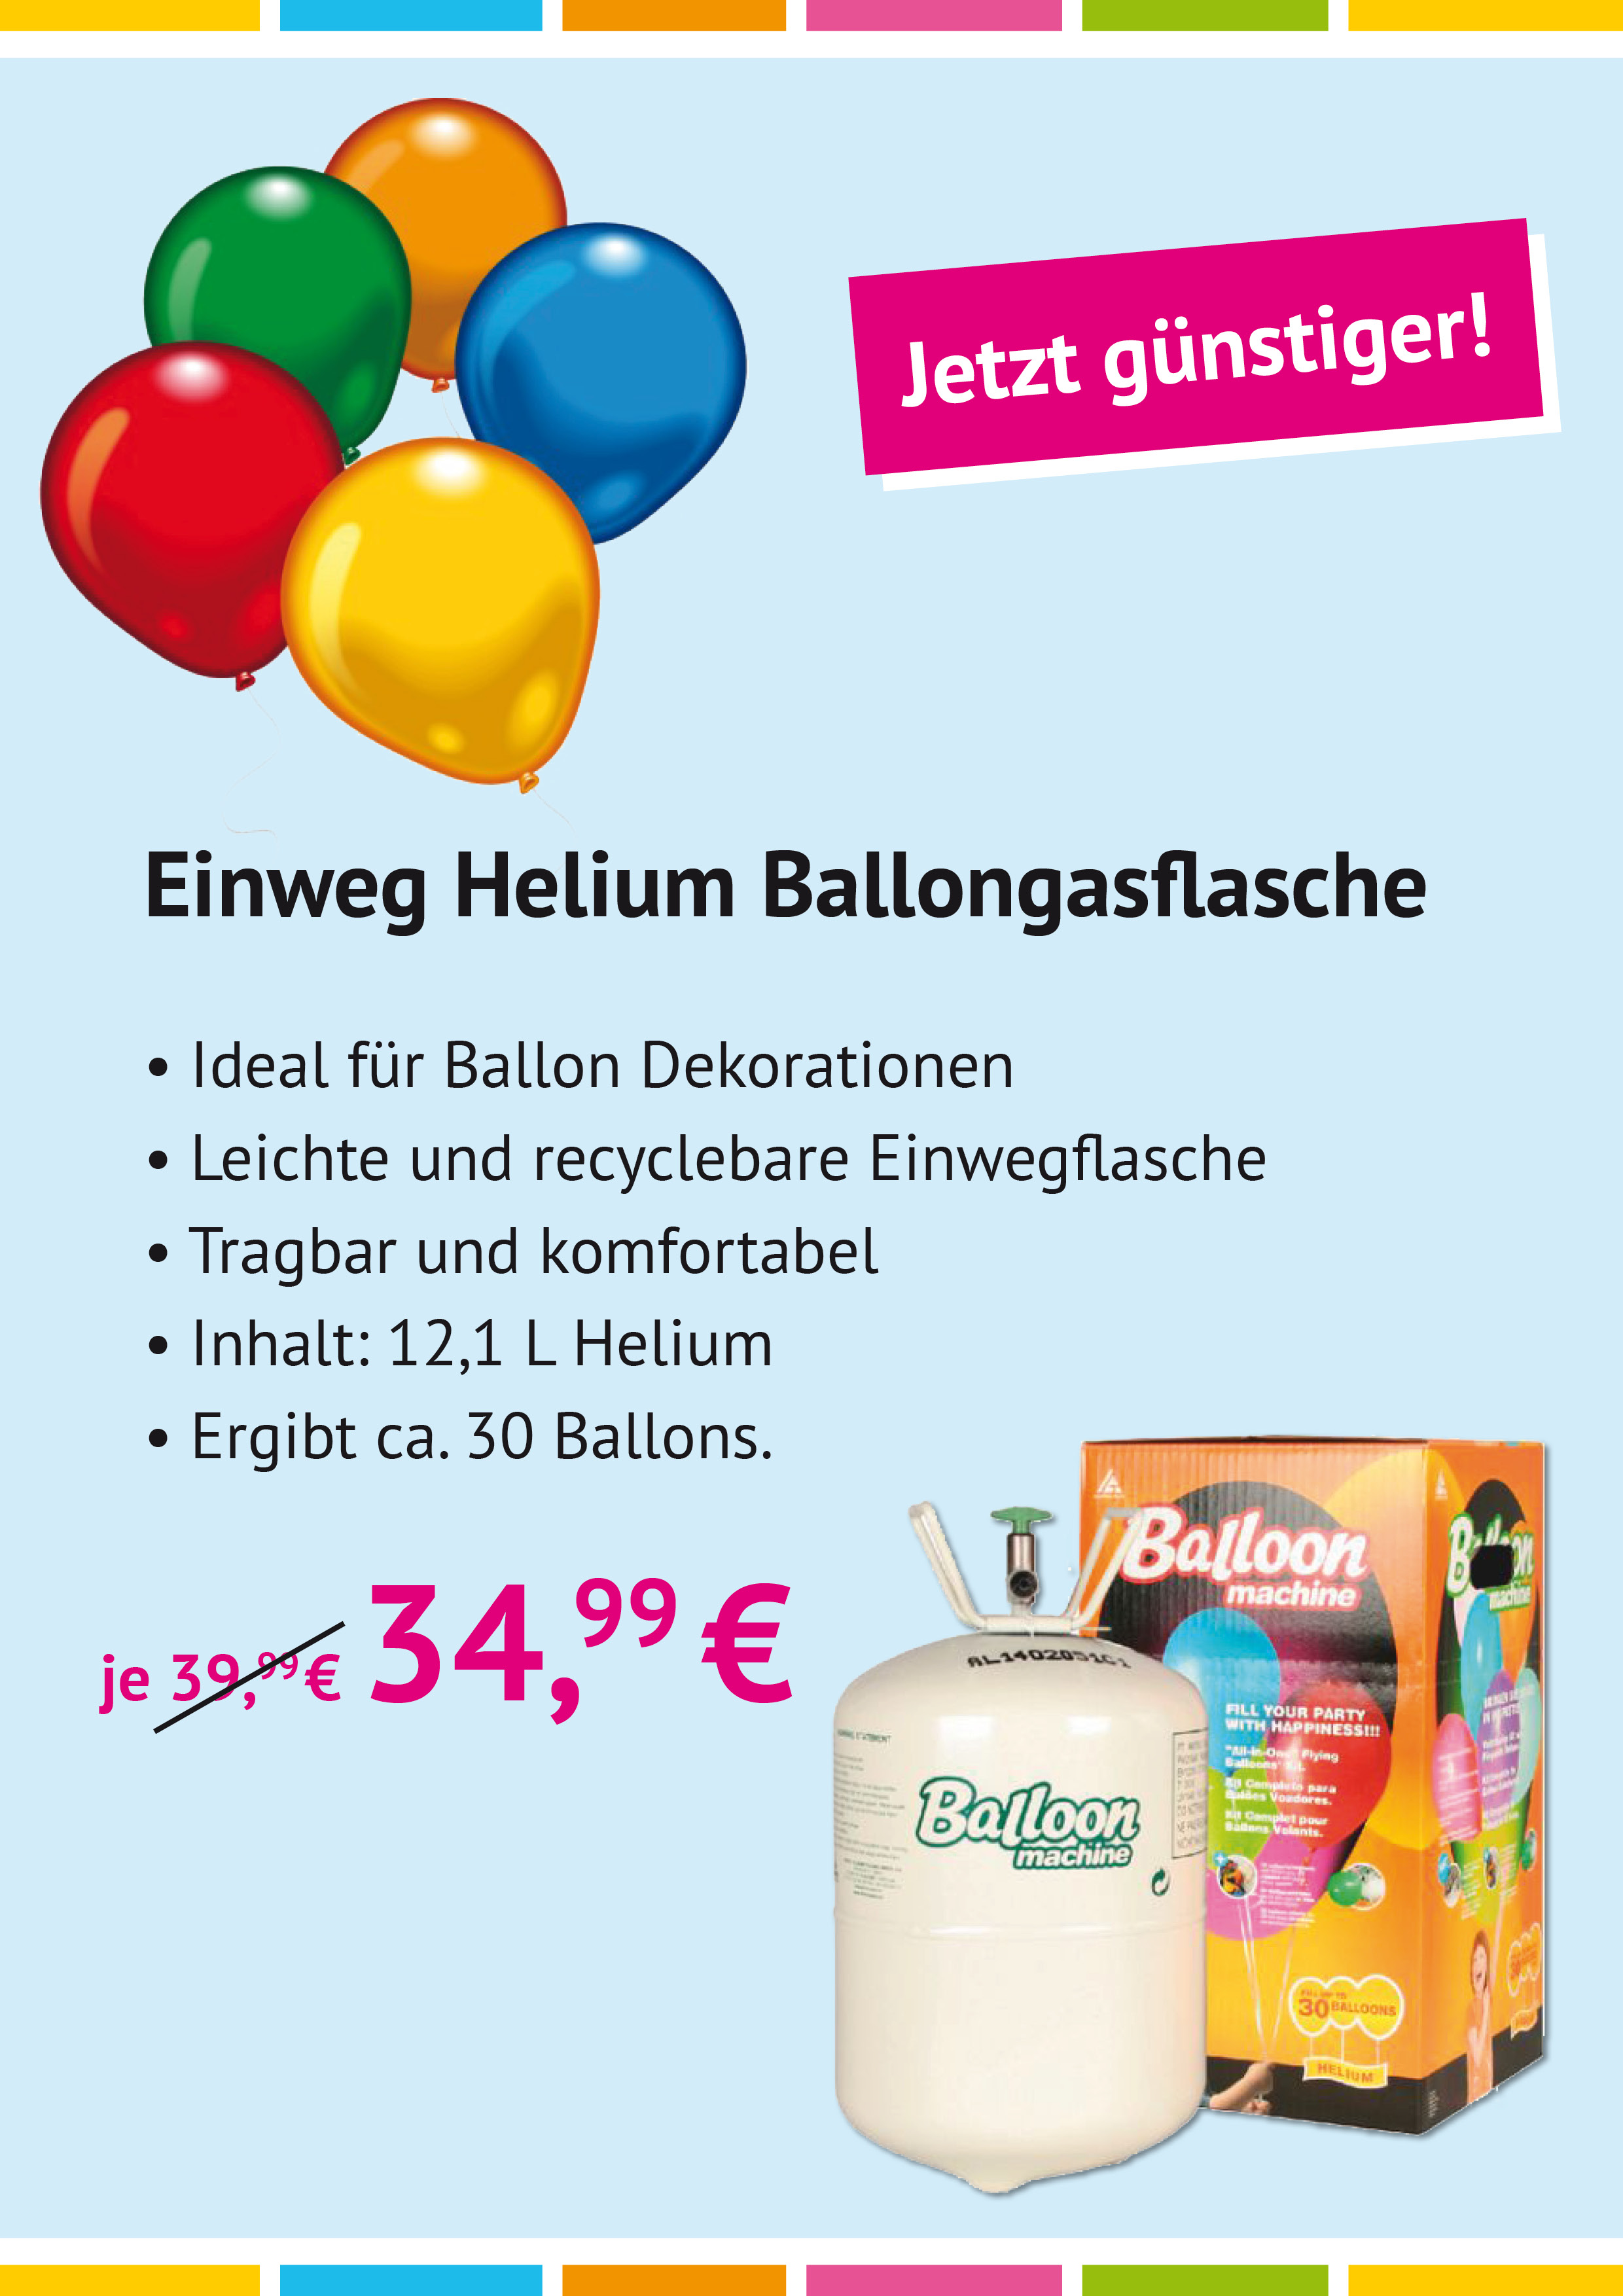 Helium, Ballons, Ballonmaschine, Amscan